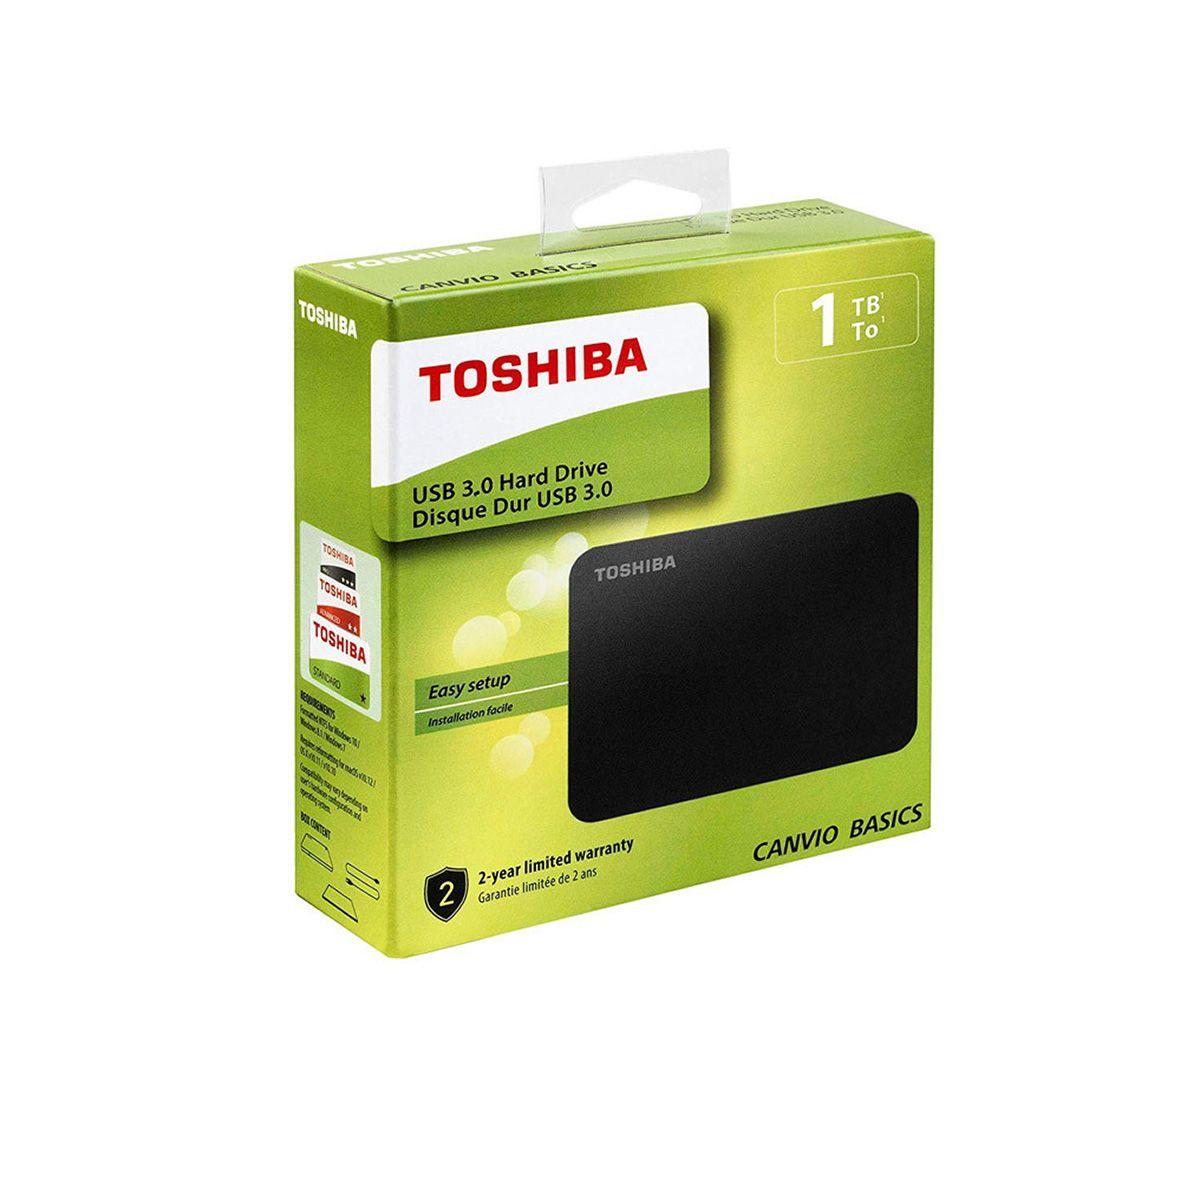 Disco duro externo Toshiba Canvio Basic 1TB/2,5″ USB 3.0